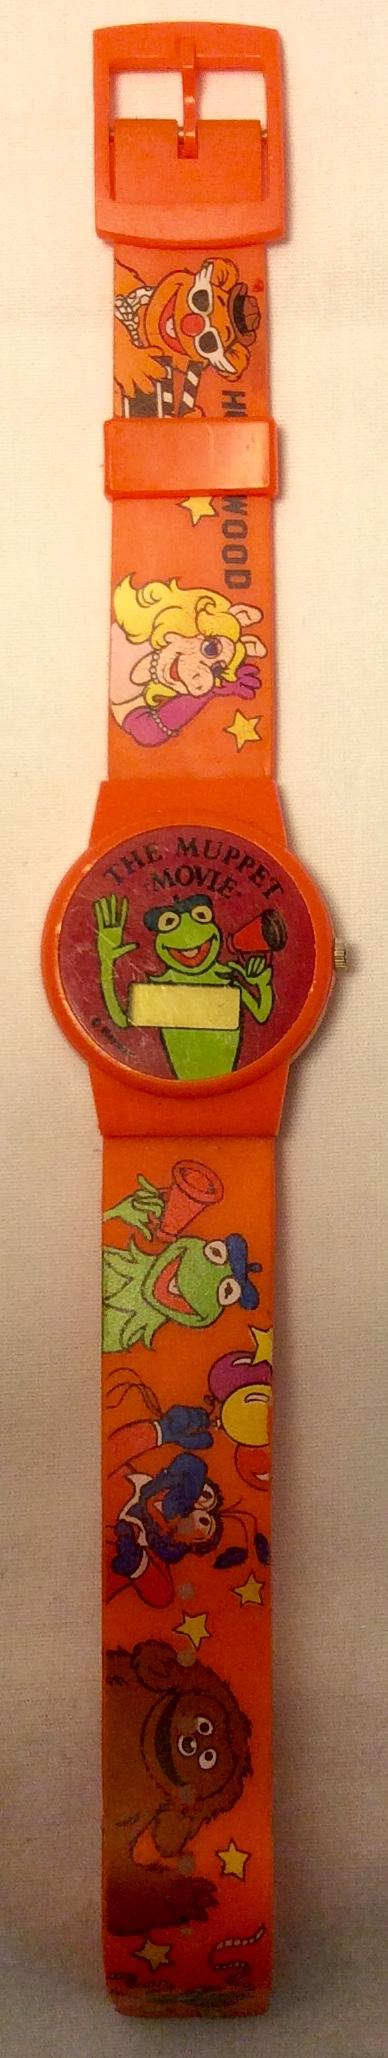 Kermit the frog watch